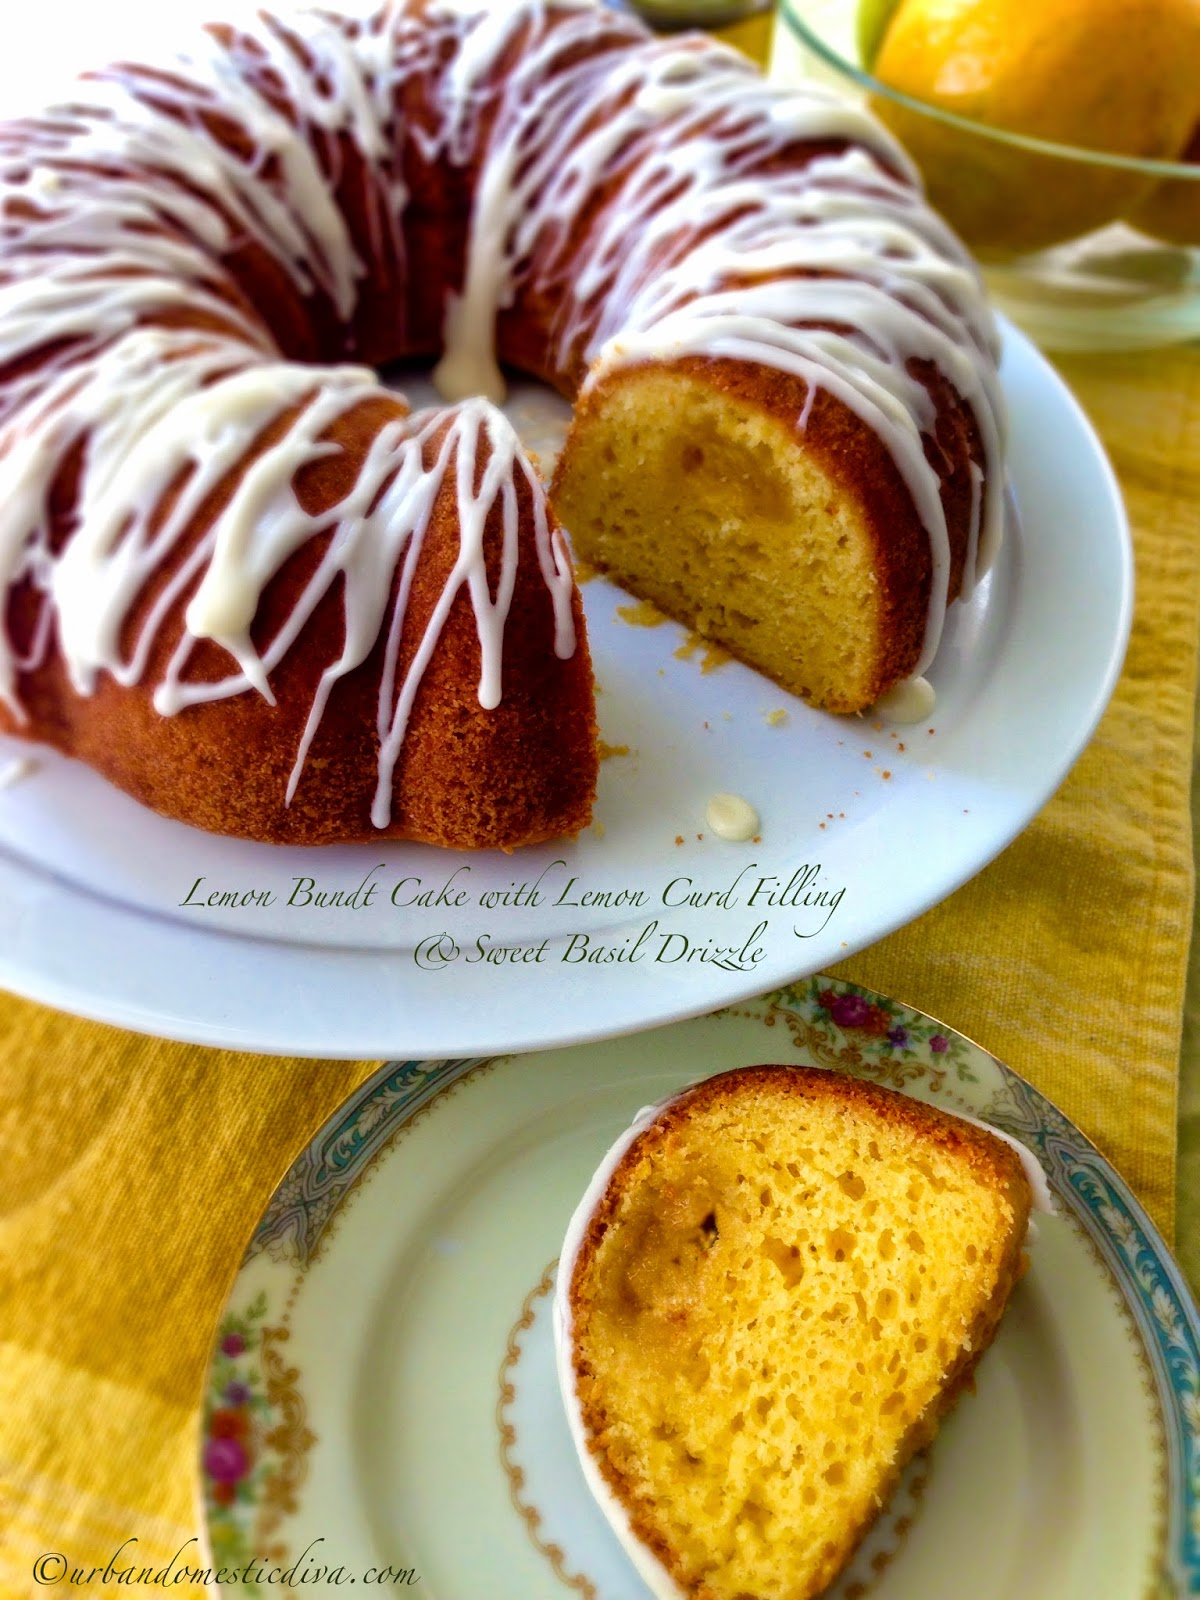 Recipe Lemon Bundt Cake With Lemon Curd Filling And Sweet